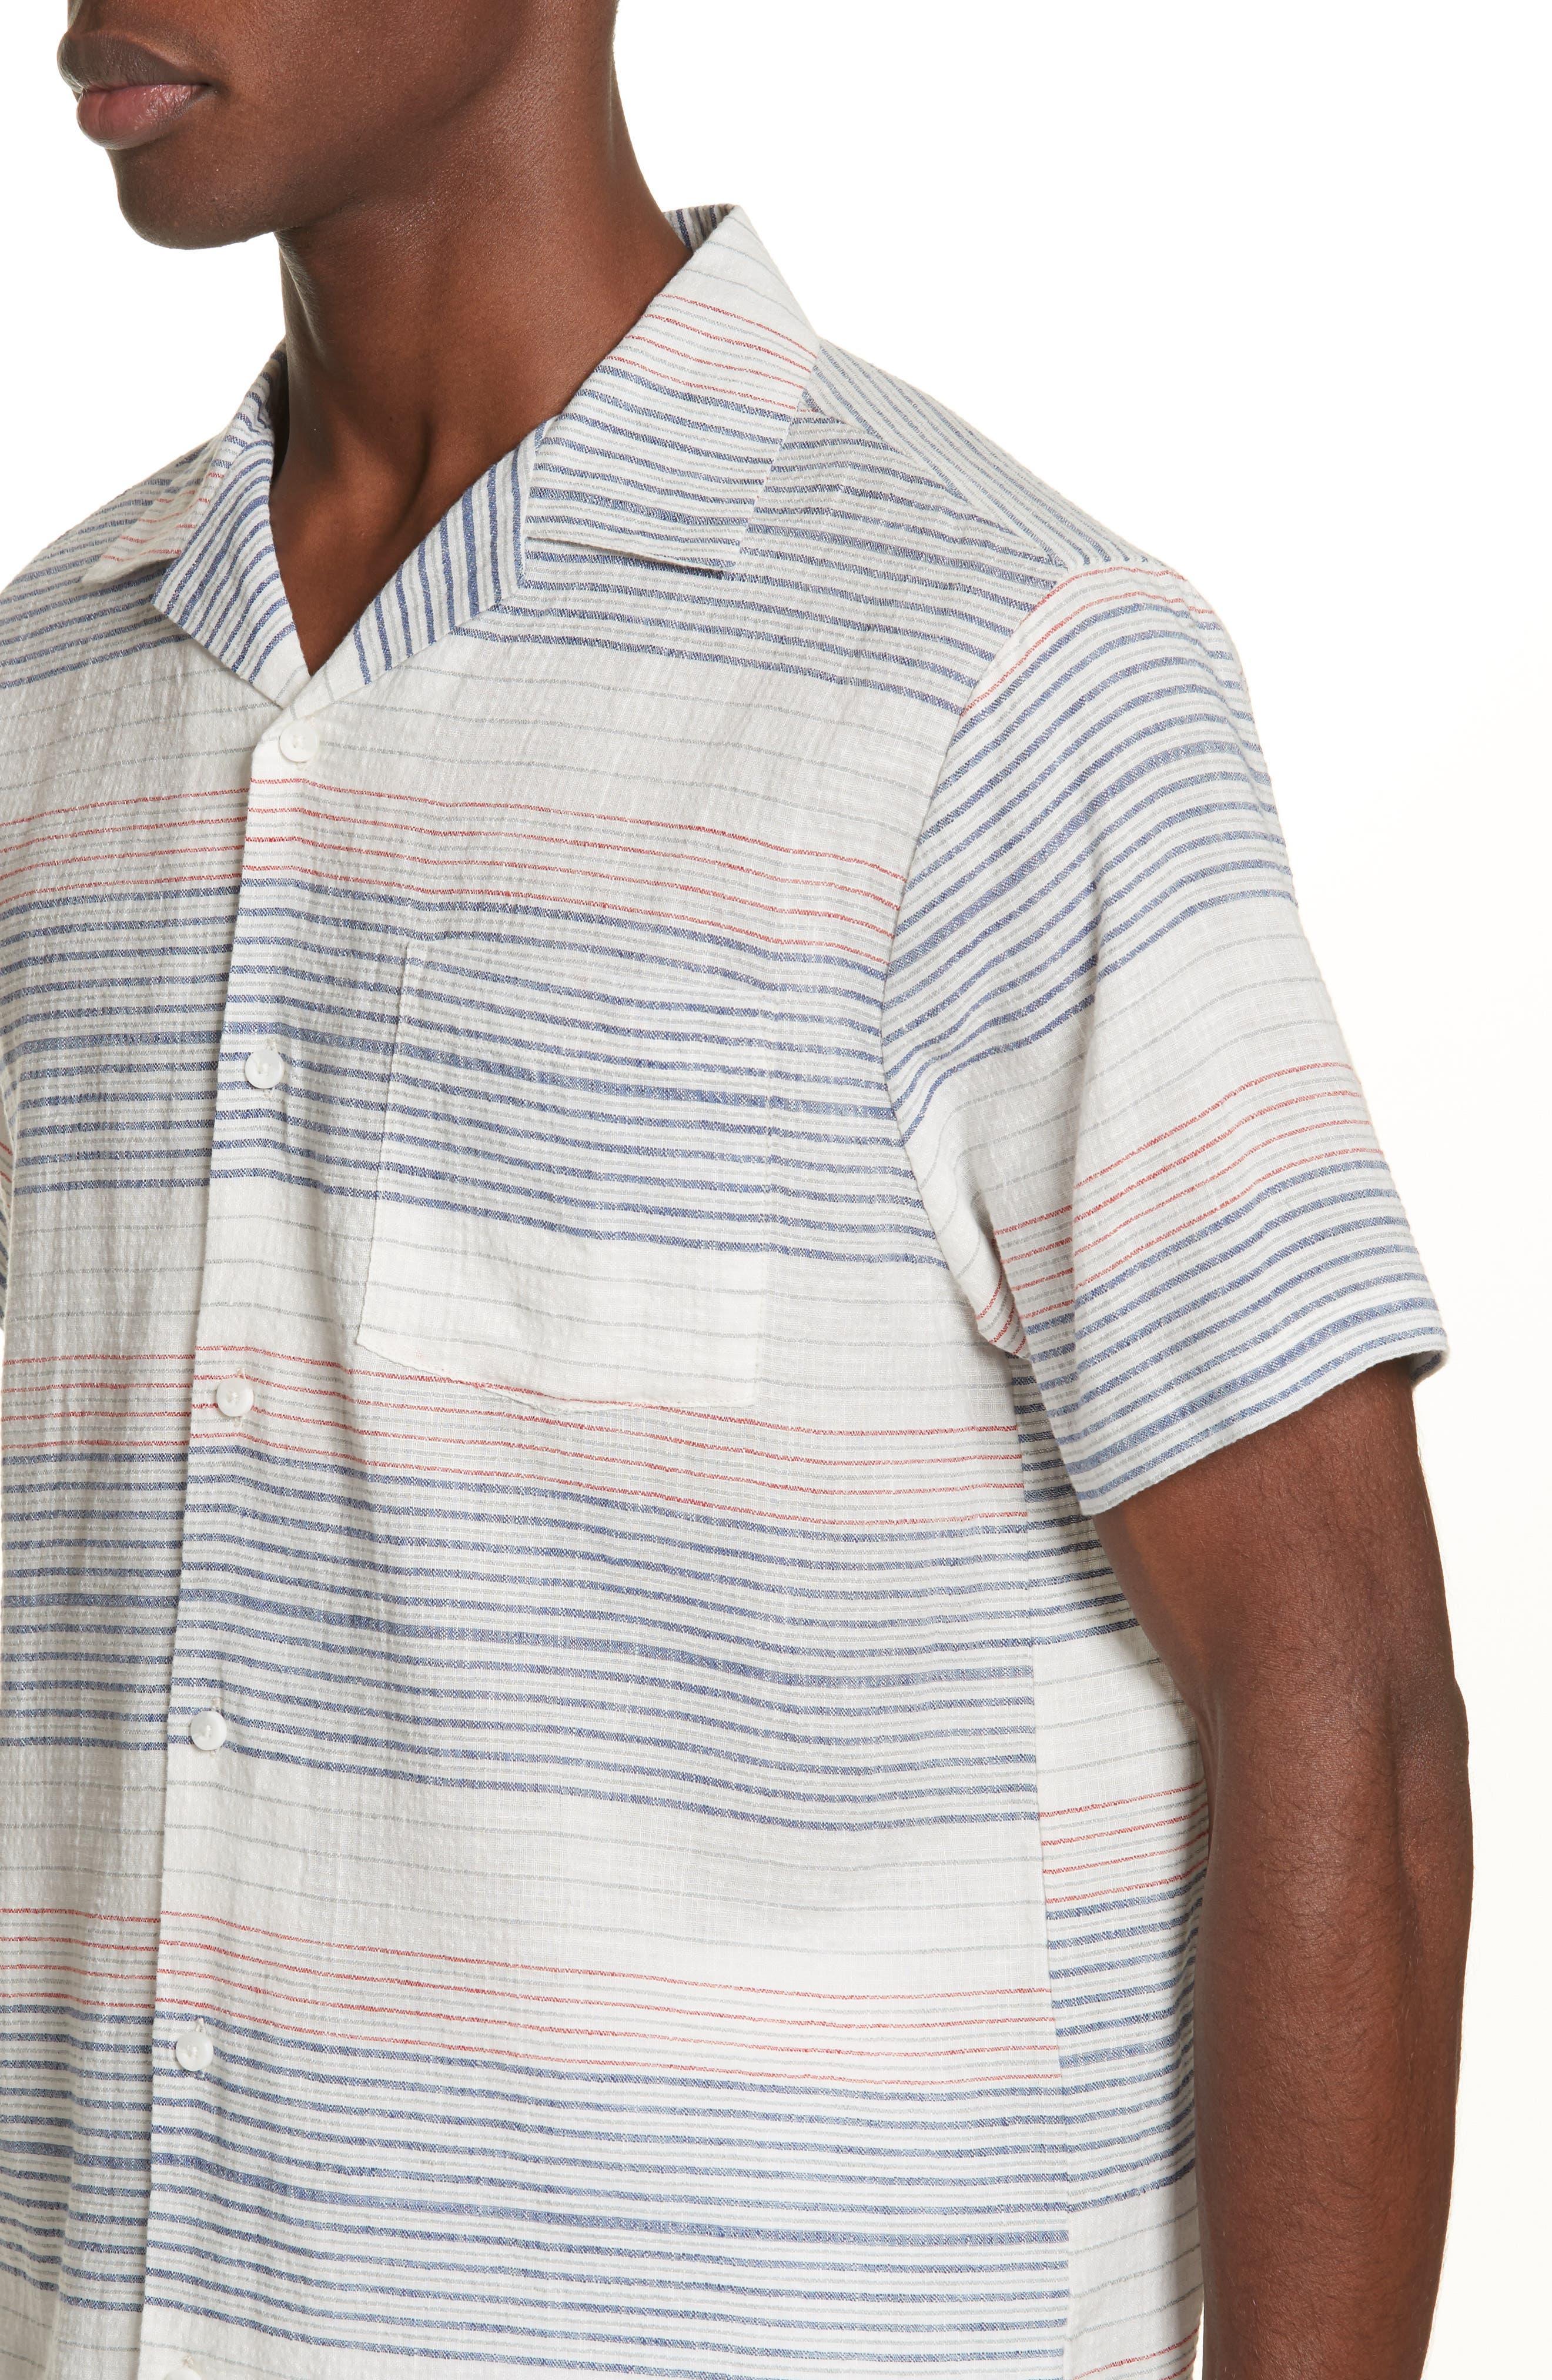 Americana Stripe Woven Camp Shirt,                             Alternate thumbnail 4, color,                             Multi